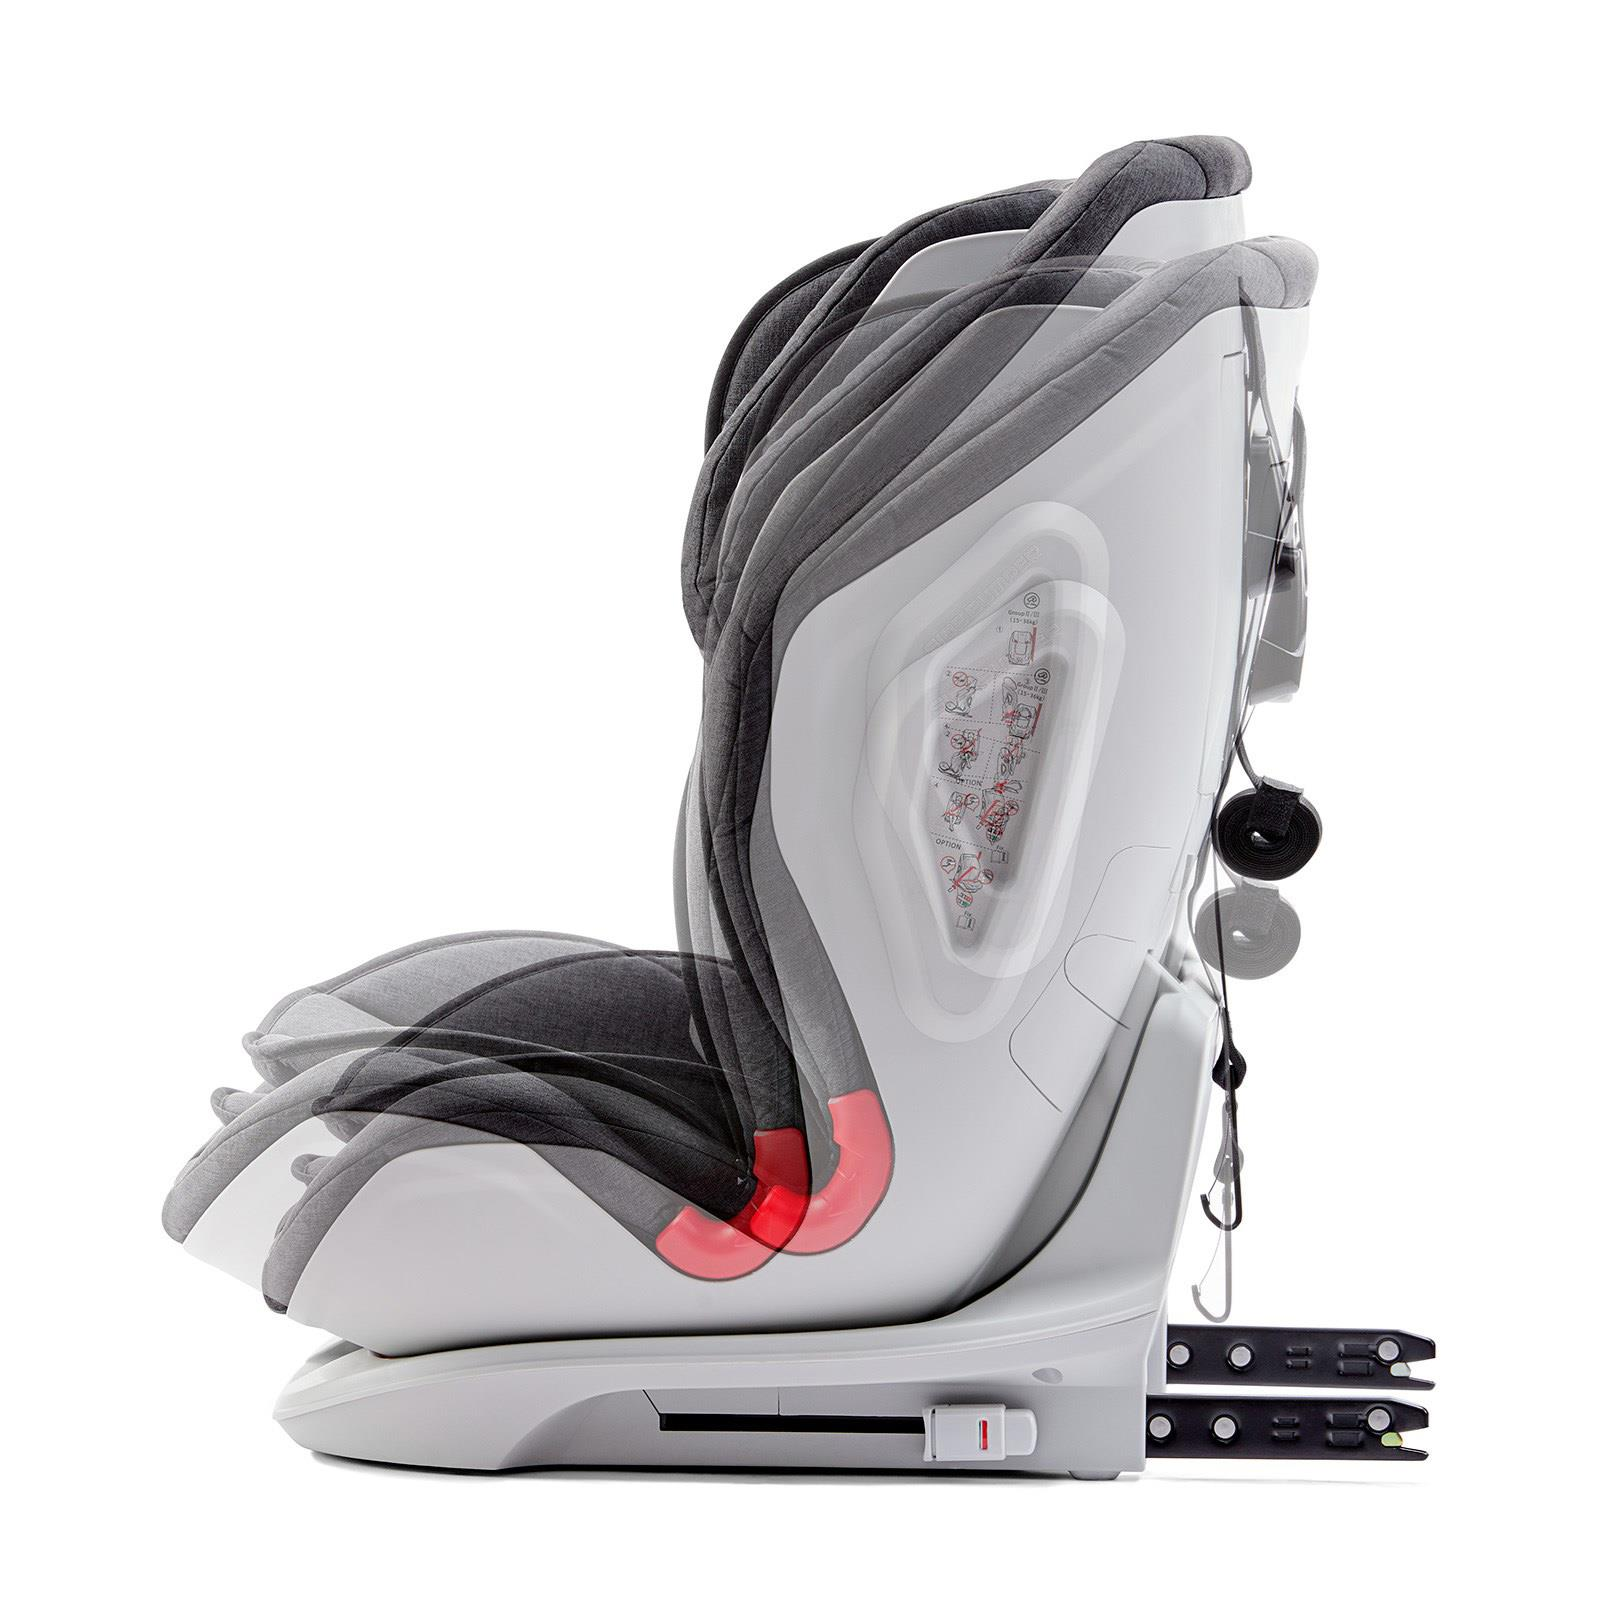 Car Seat Oneto3 9-36kg Isofix black auto bērnu sēdeklītis